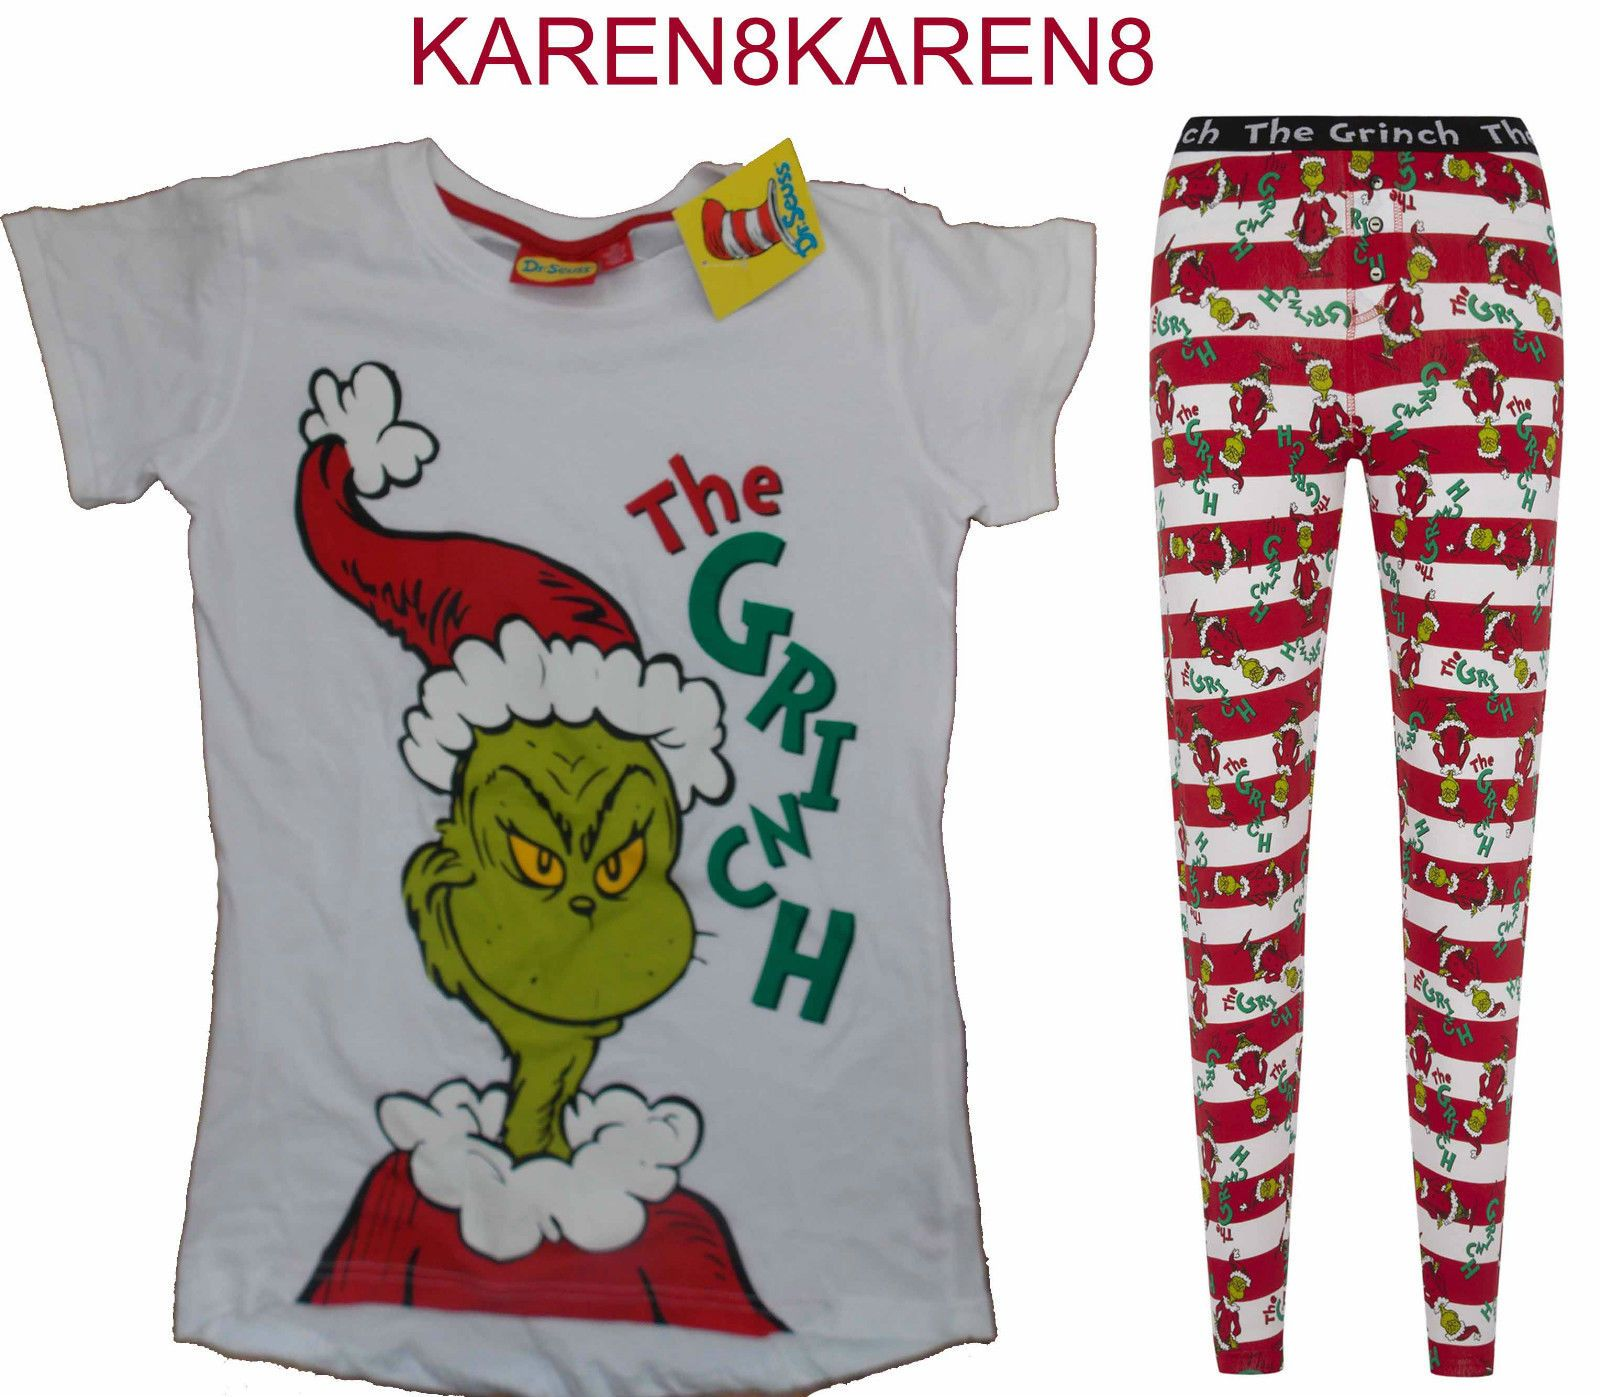 505e42f870b4 The Grinch Christmas Pyjamas Great for Christmas Holidays! karen8karen8 on  ebay